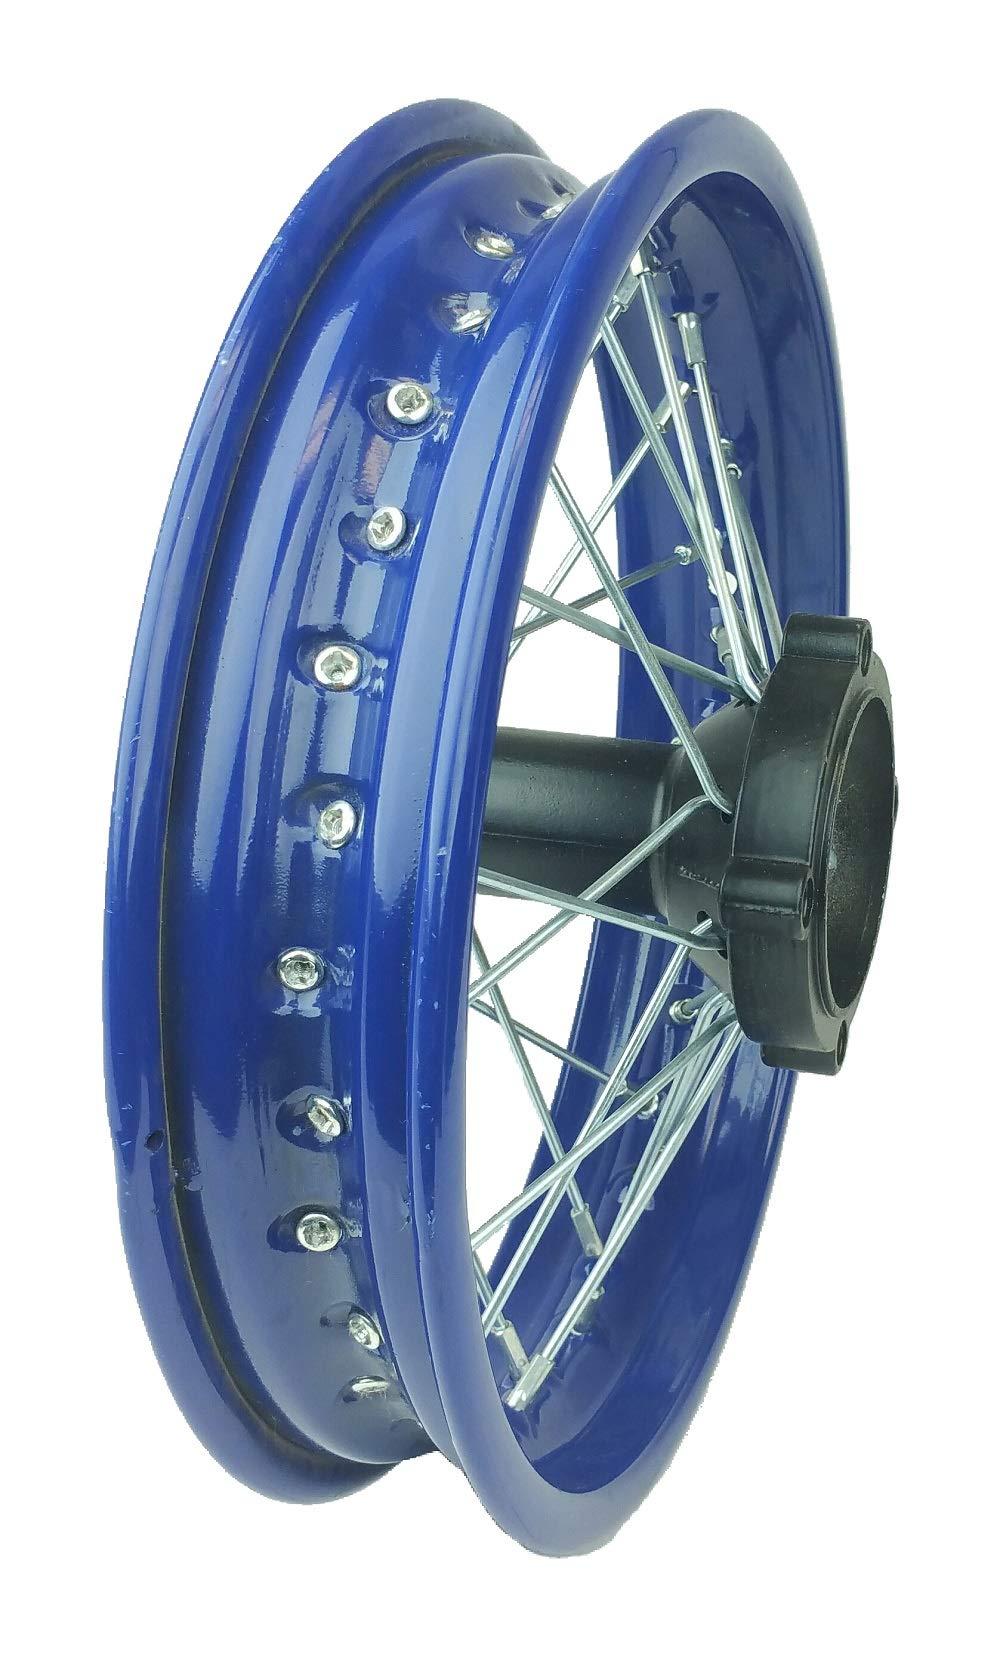 12'' Steel BLACK Rear Rim Wheel Disk Brake Apollo SSR 125cc XR CRF Dirt Pit Bike Chines Made Dirt Bikes 12mm Shaft